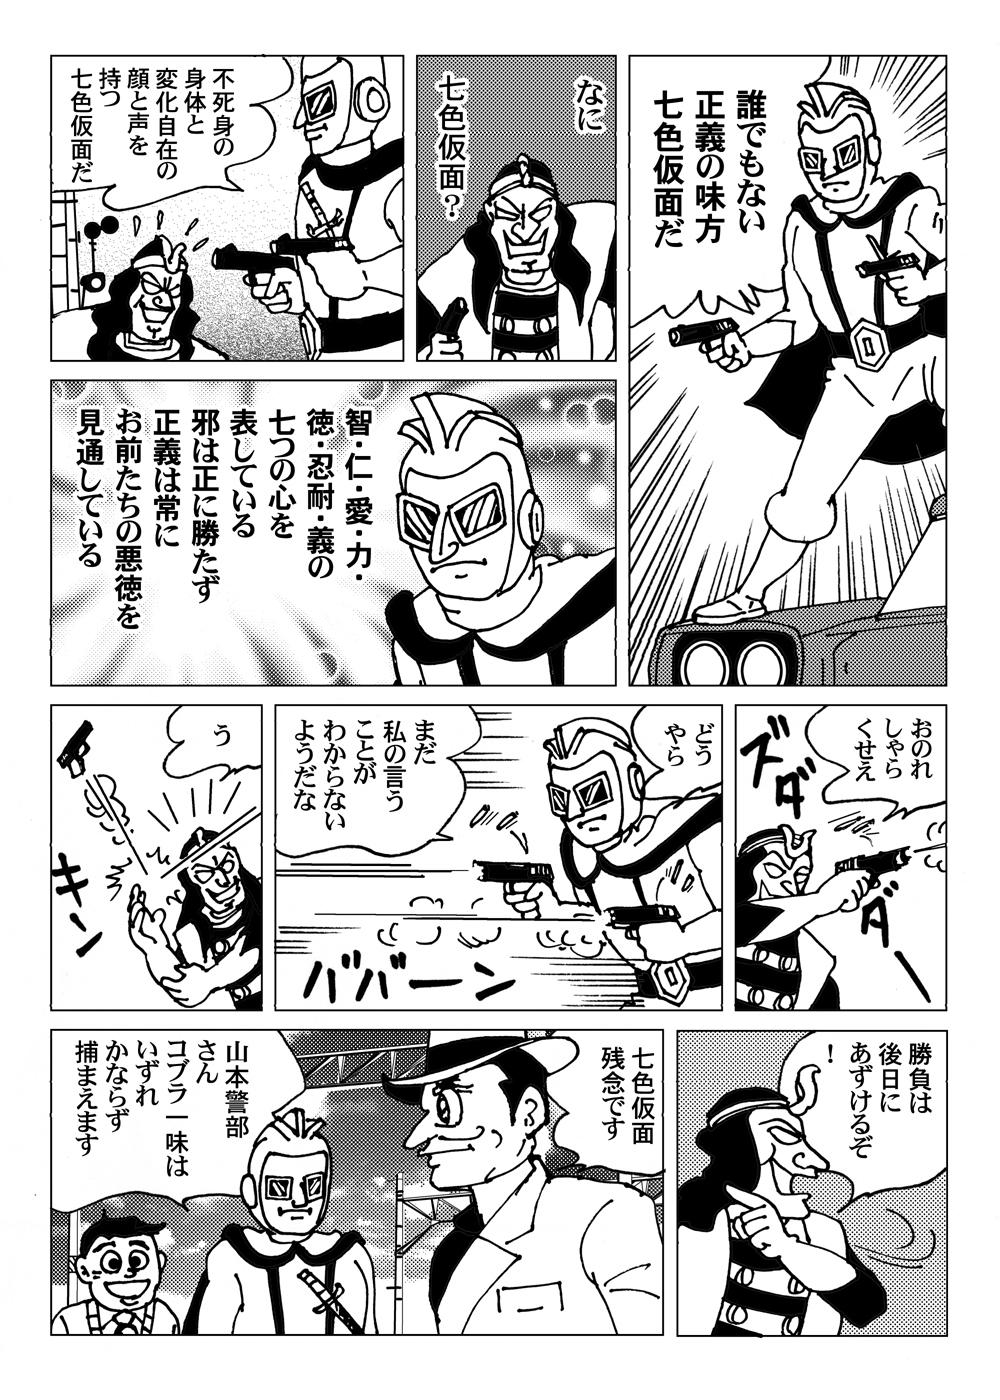 002-七色仮面-002-m